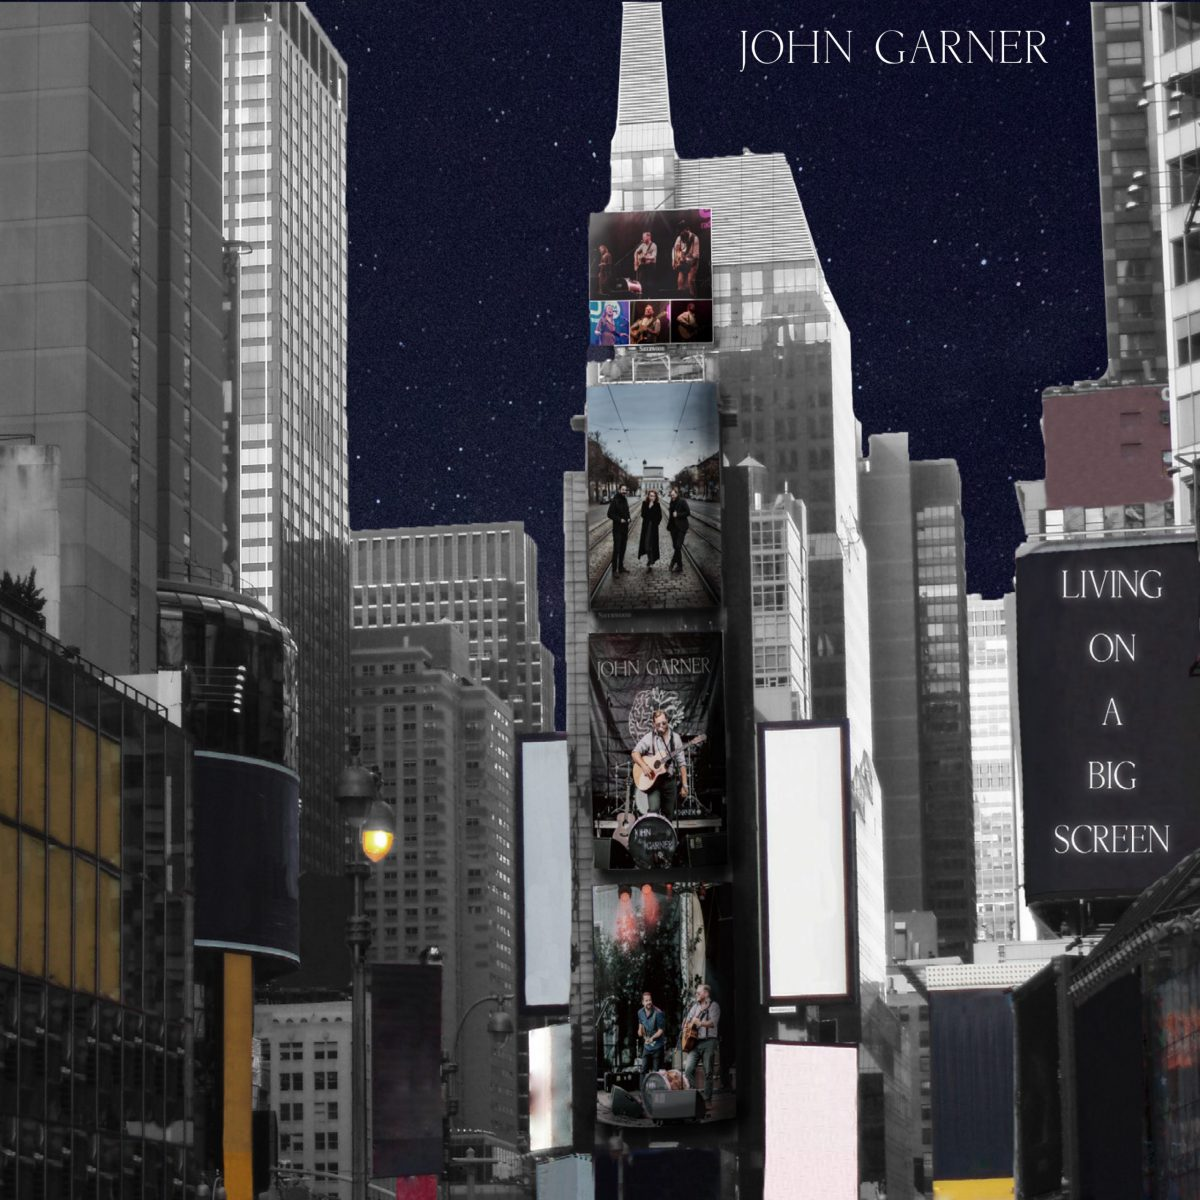 john-garner-living-on-a-big-screen-single-review-video-premiere